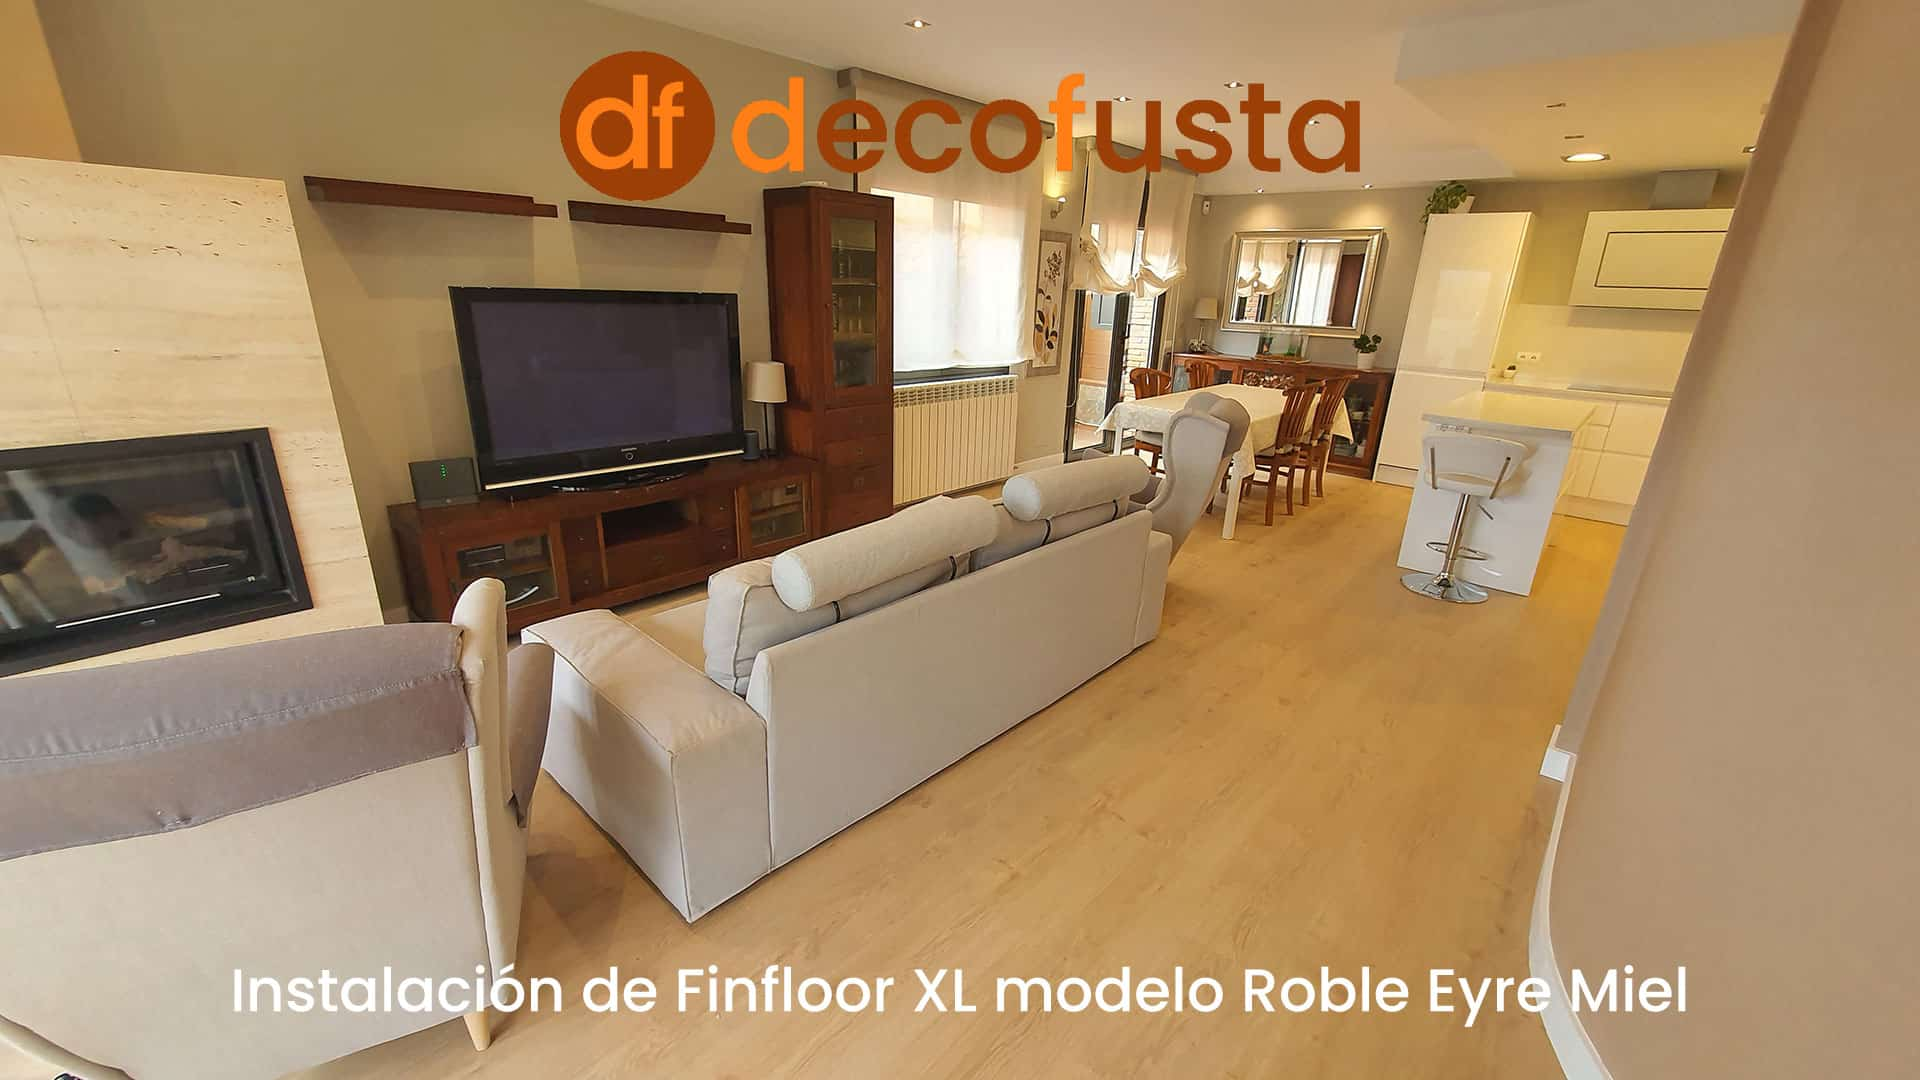 Instalación de Finfloor XL modelo Roble Eyre Miel